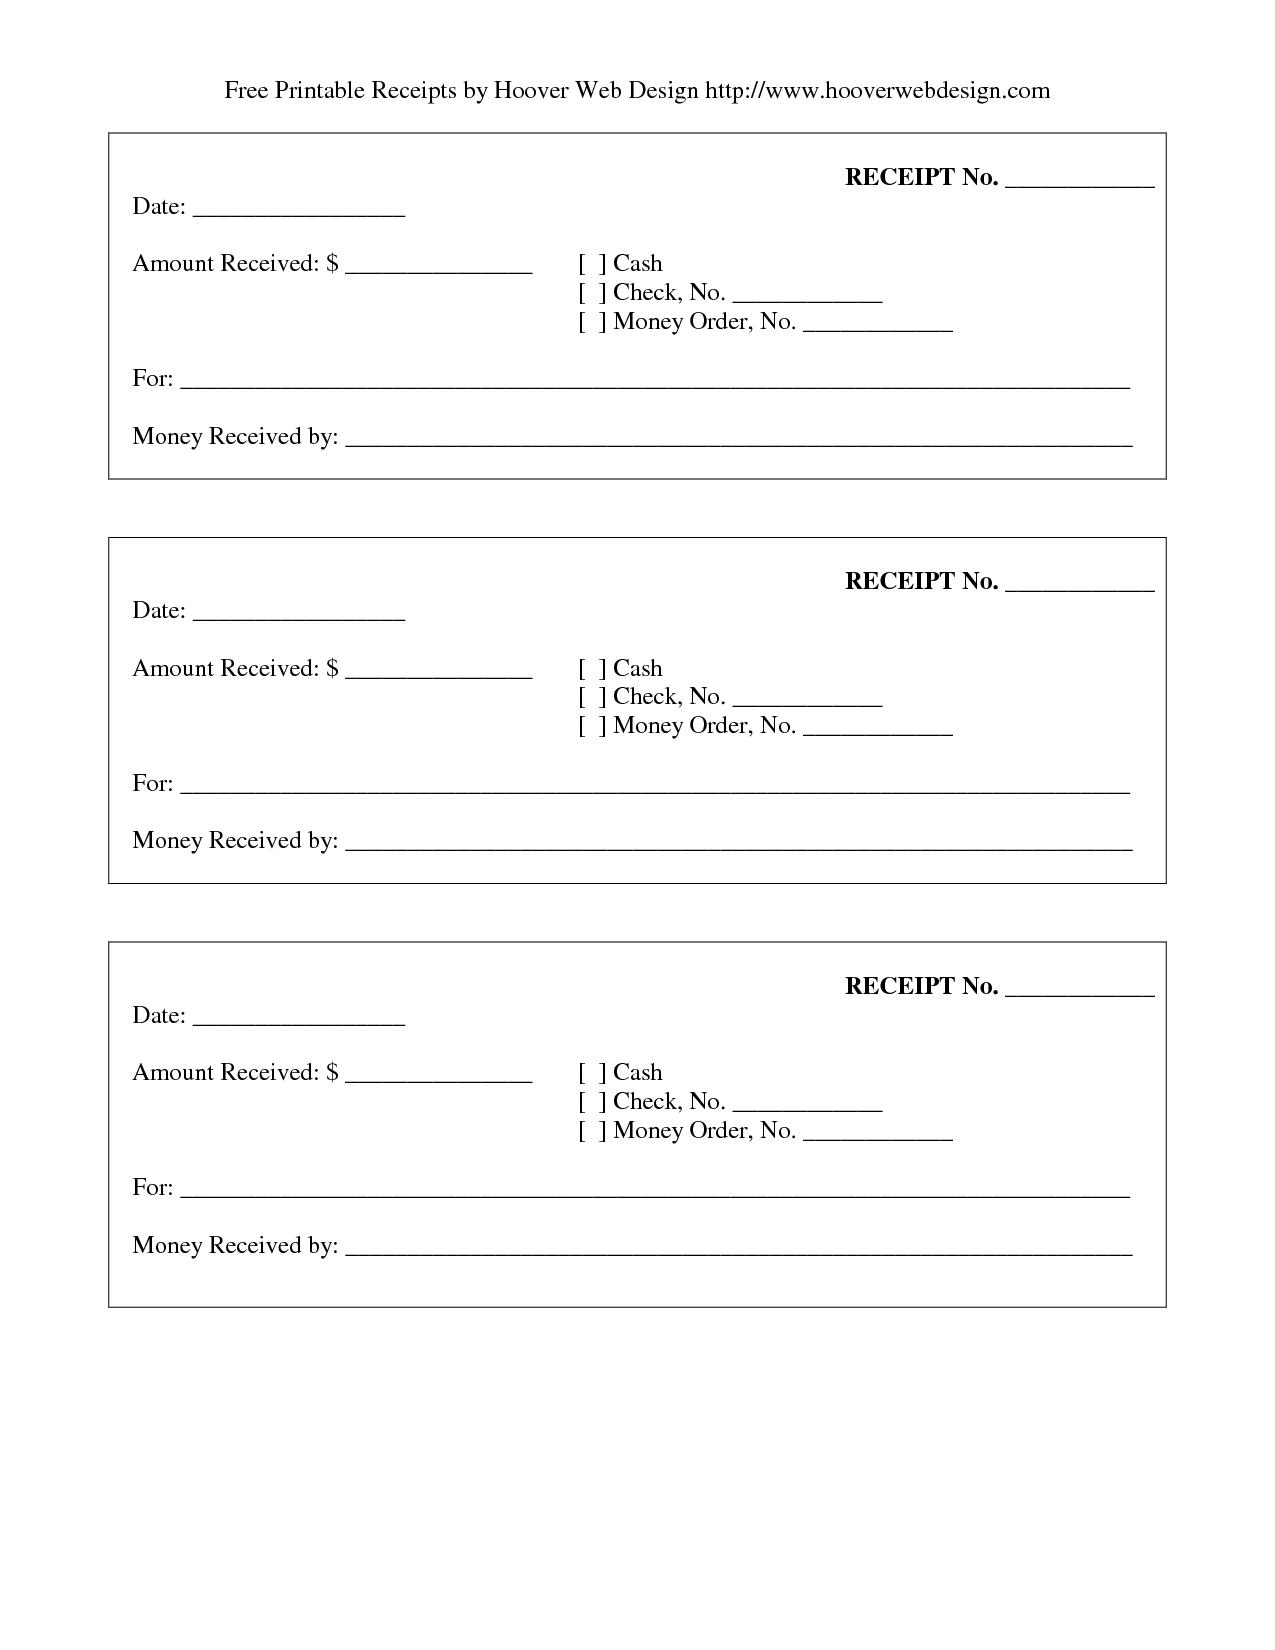 Print Receipt | Free Printable Receipt | Stuff To Buy In 2019 - Free Printable Receipt Template